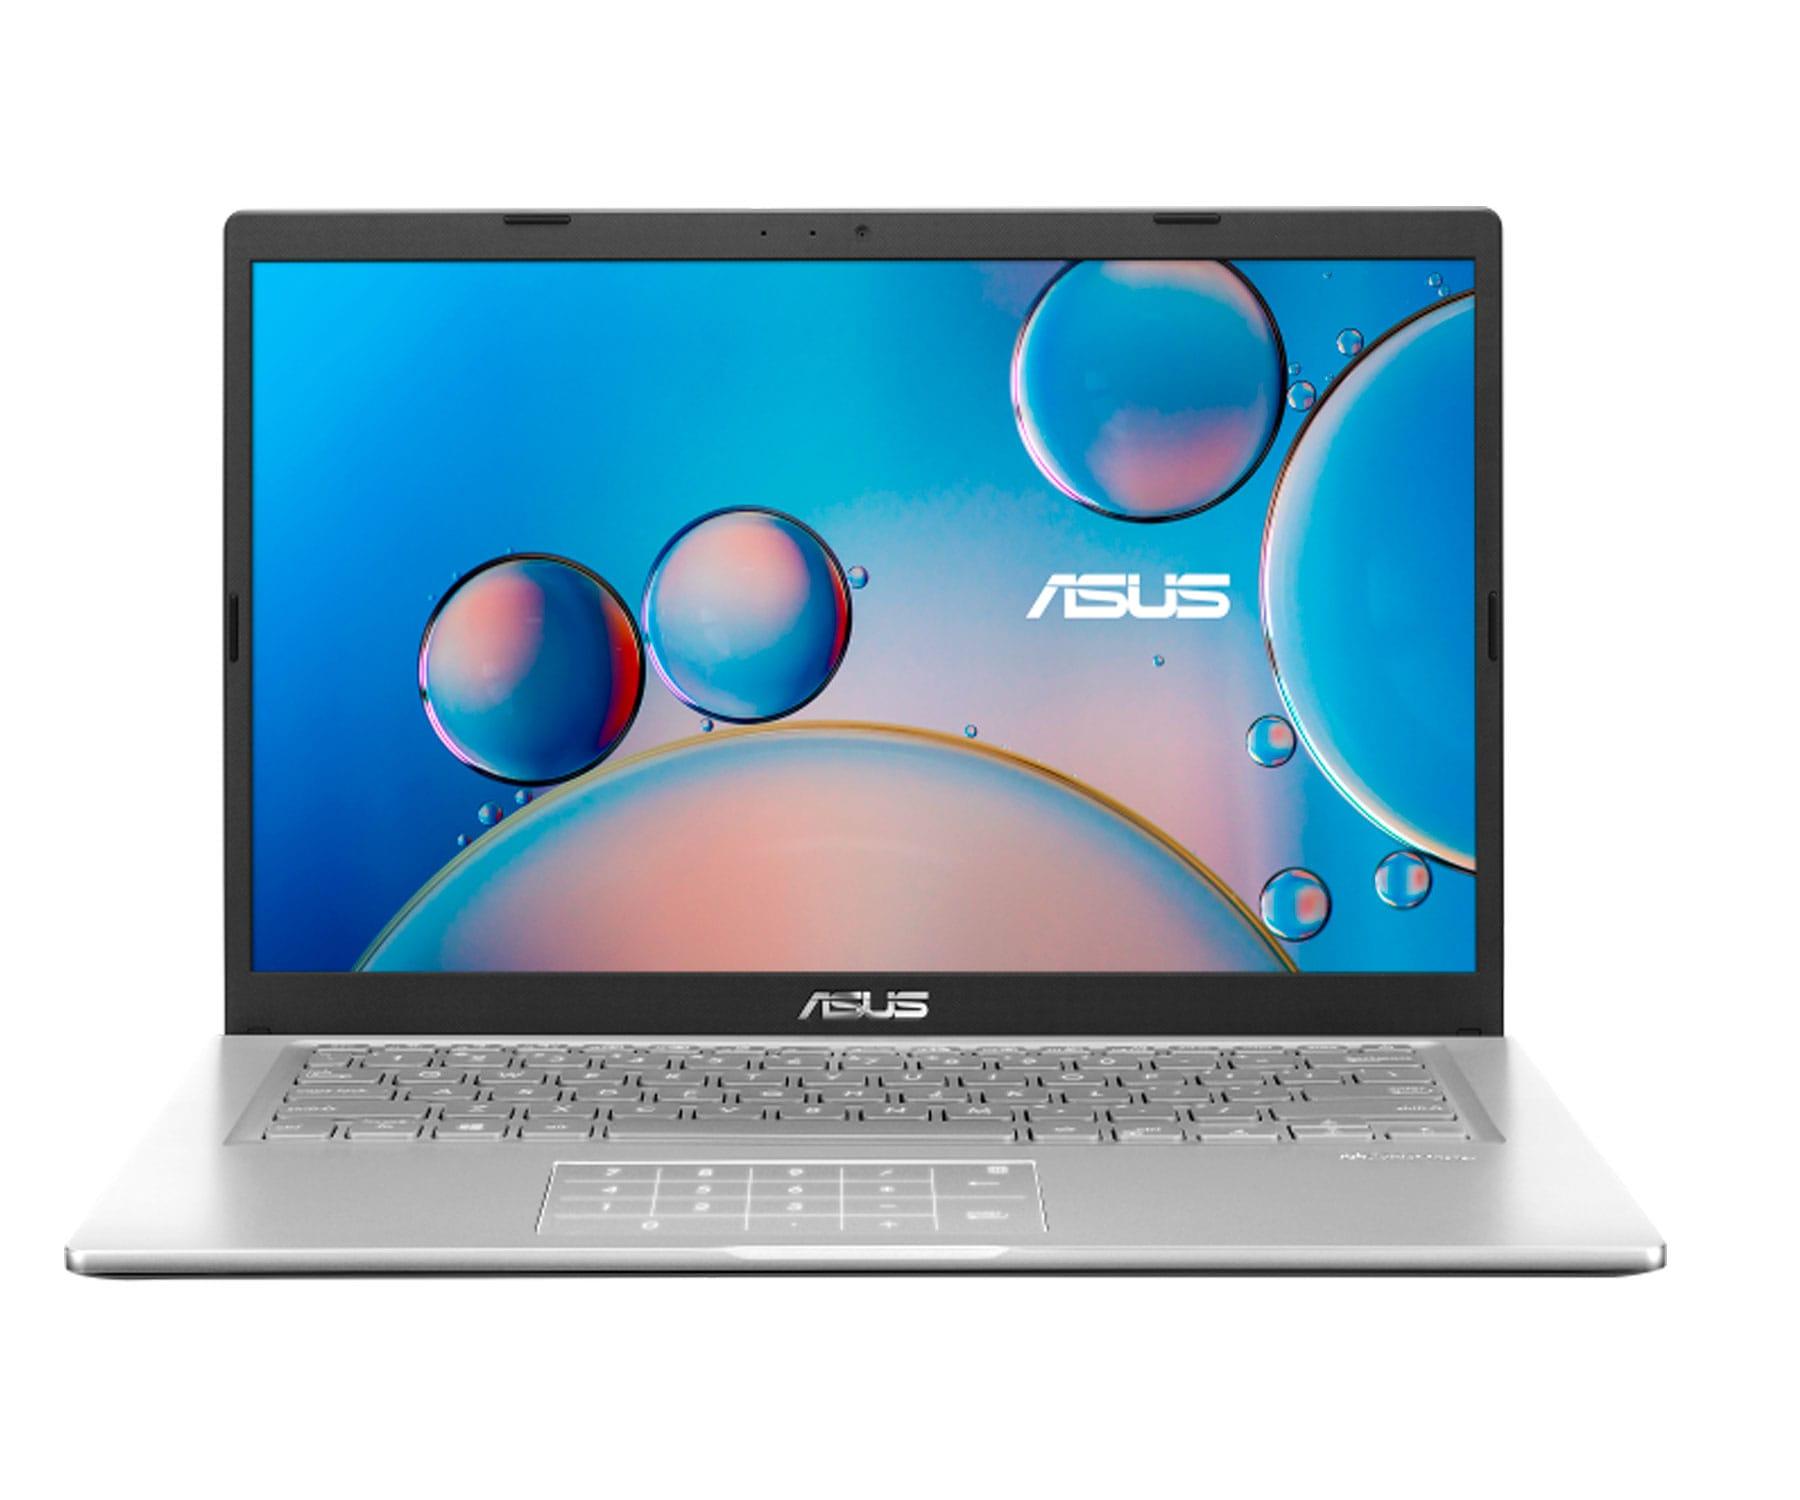 "ASUS VIVOBOOK F415 PORTÁTIL PLATA 14"" HD+ / CELERON N4020 / 4GB / 256GB SSD / WINDOWS"